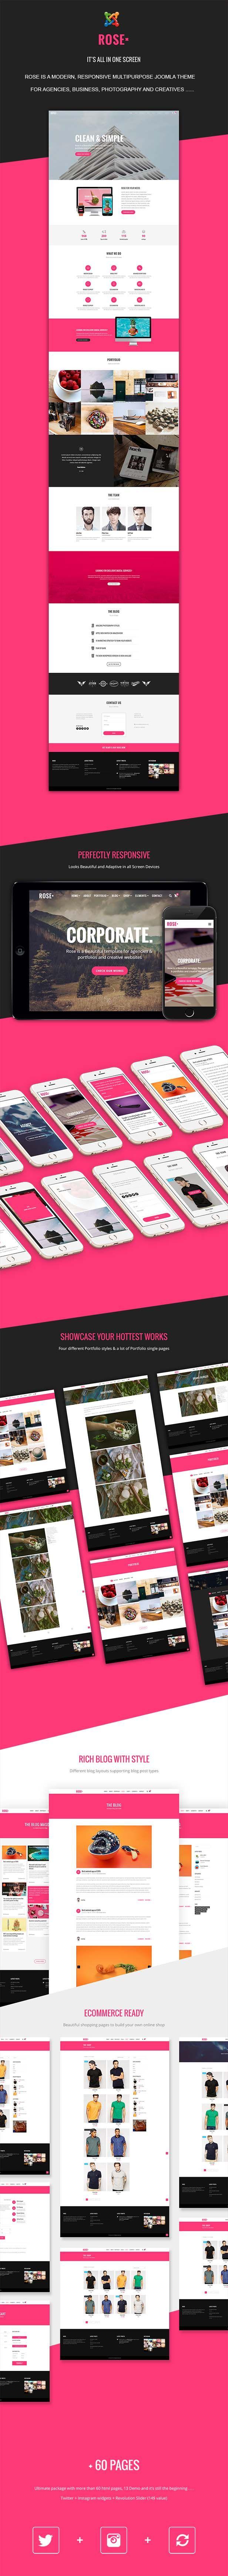 Rose - Multipurpose Responsive One Page Joomla Theme #joomla #theme #template #themeforest #envato #windstripethemes #multipurpose #business #shop #onepage